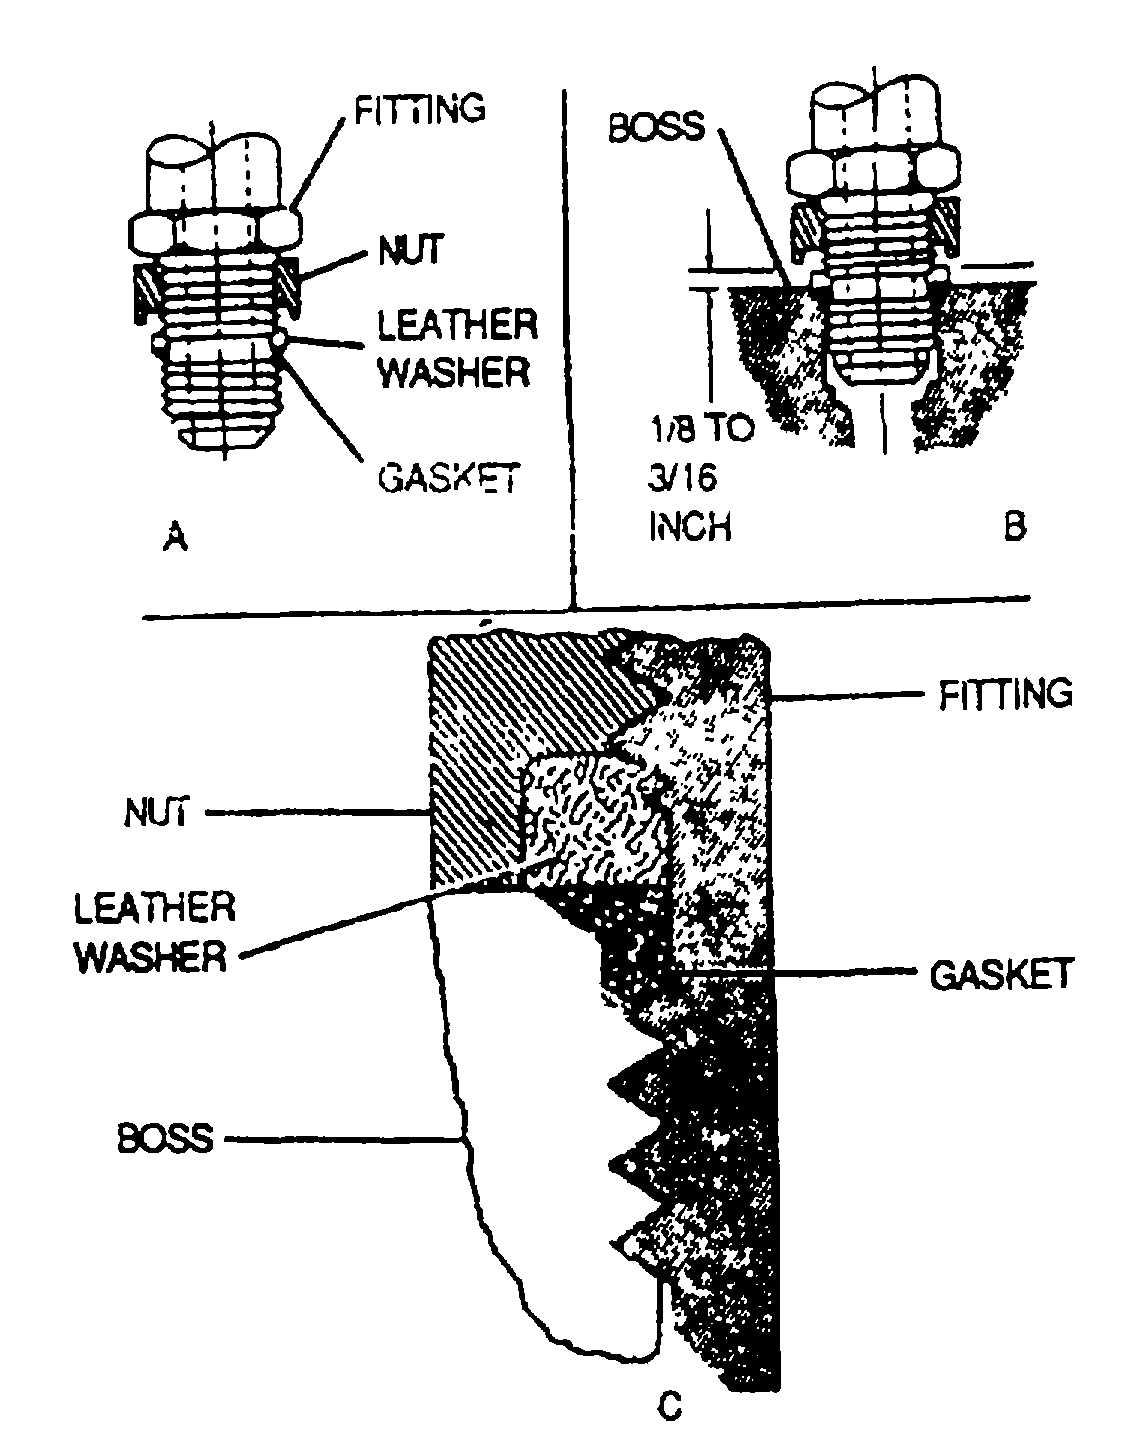 Figure 4-27. Combination Bulkhead and Universal Fitting